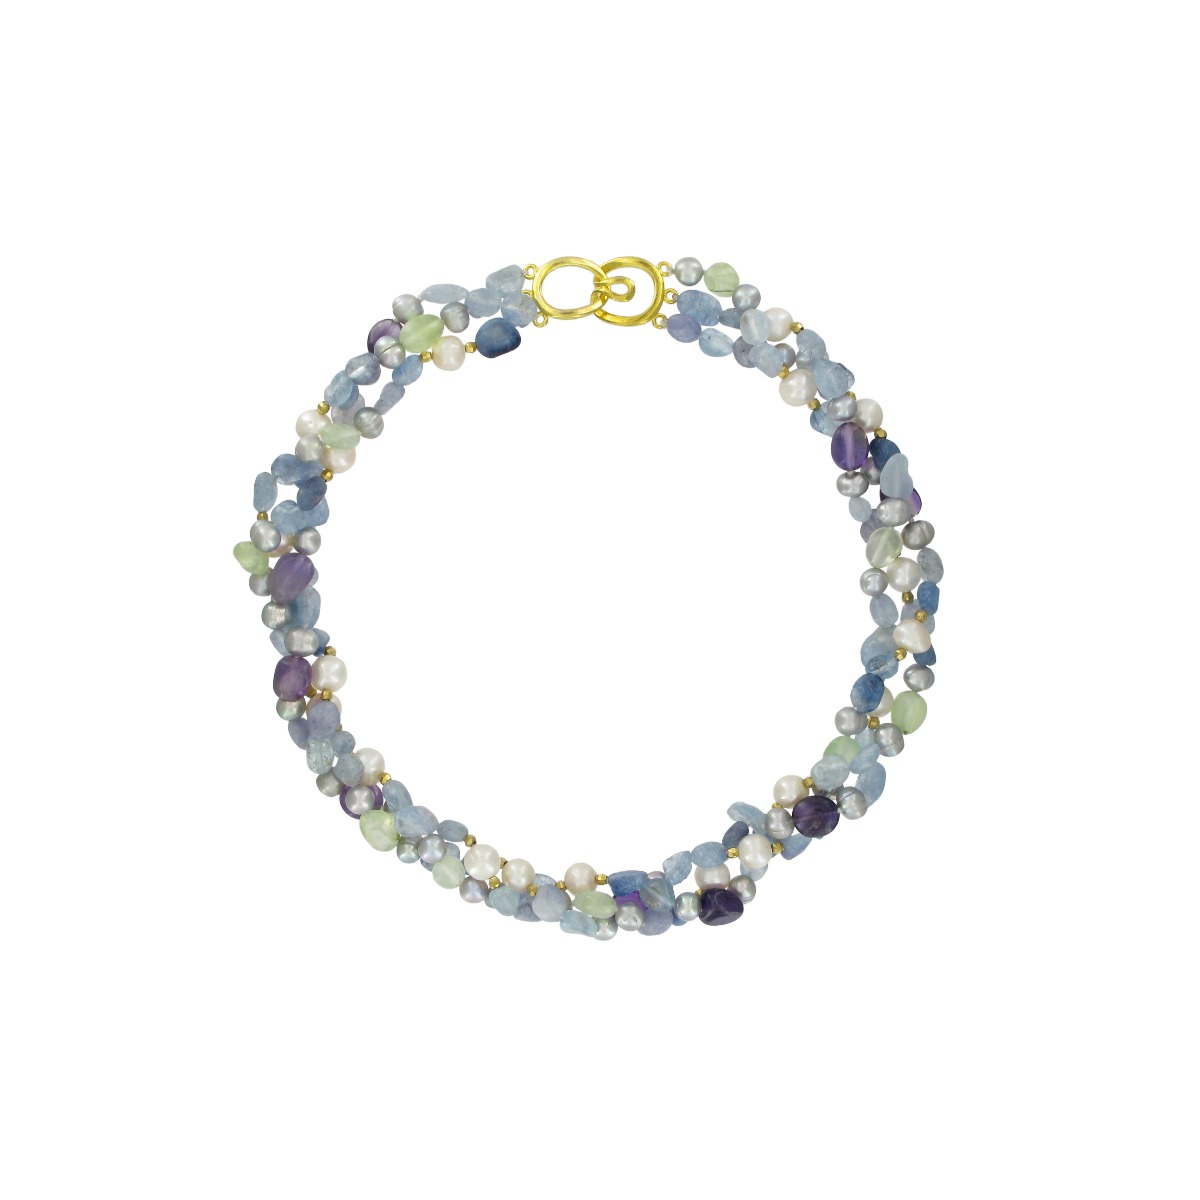 Three strand pearls necklace